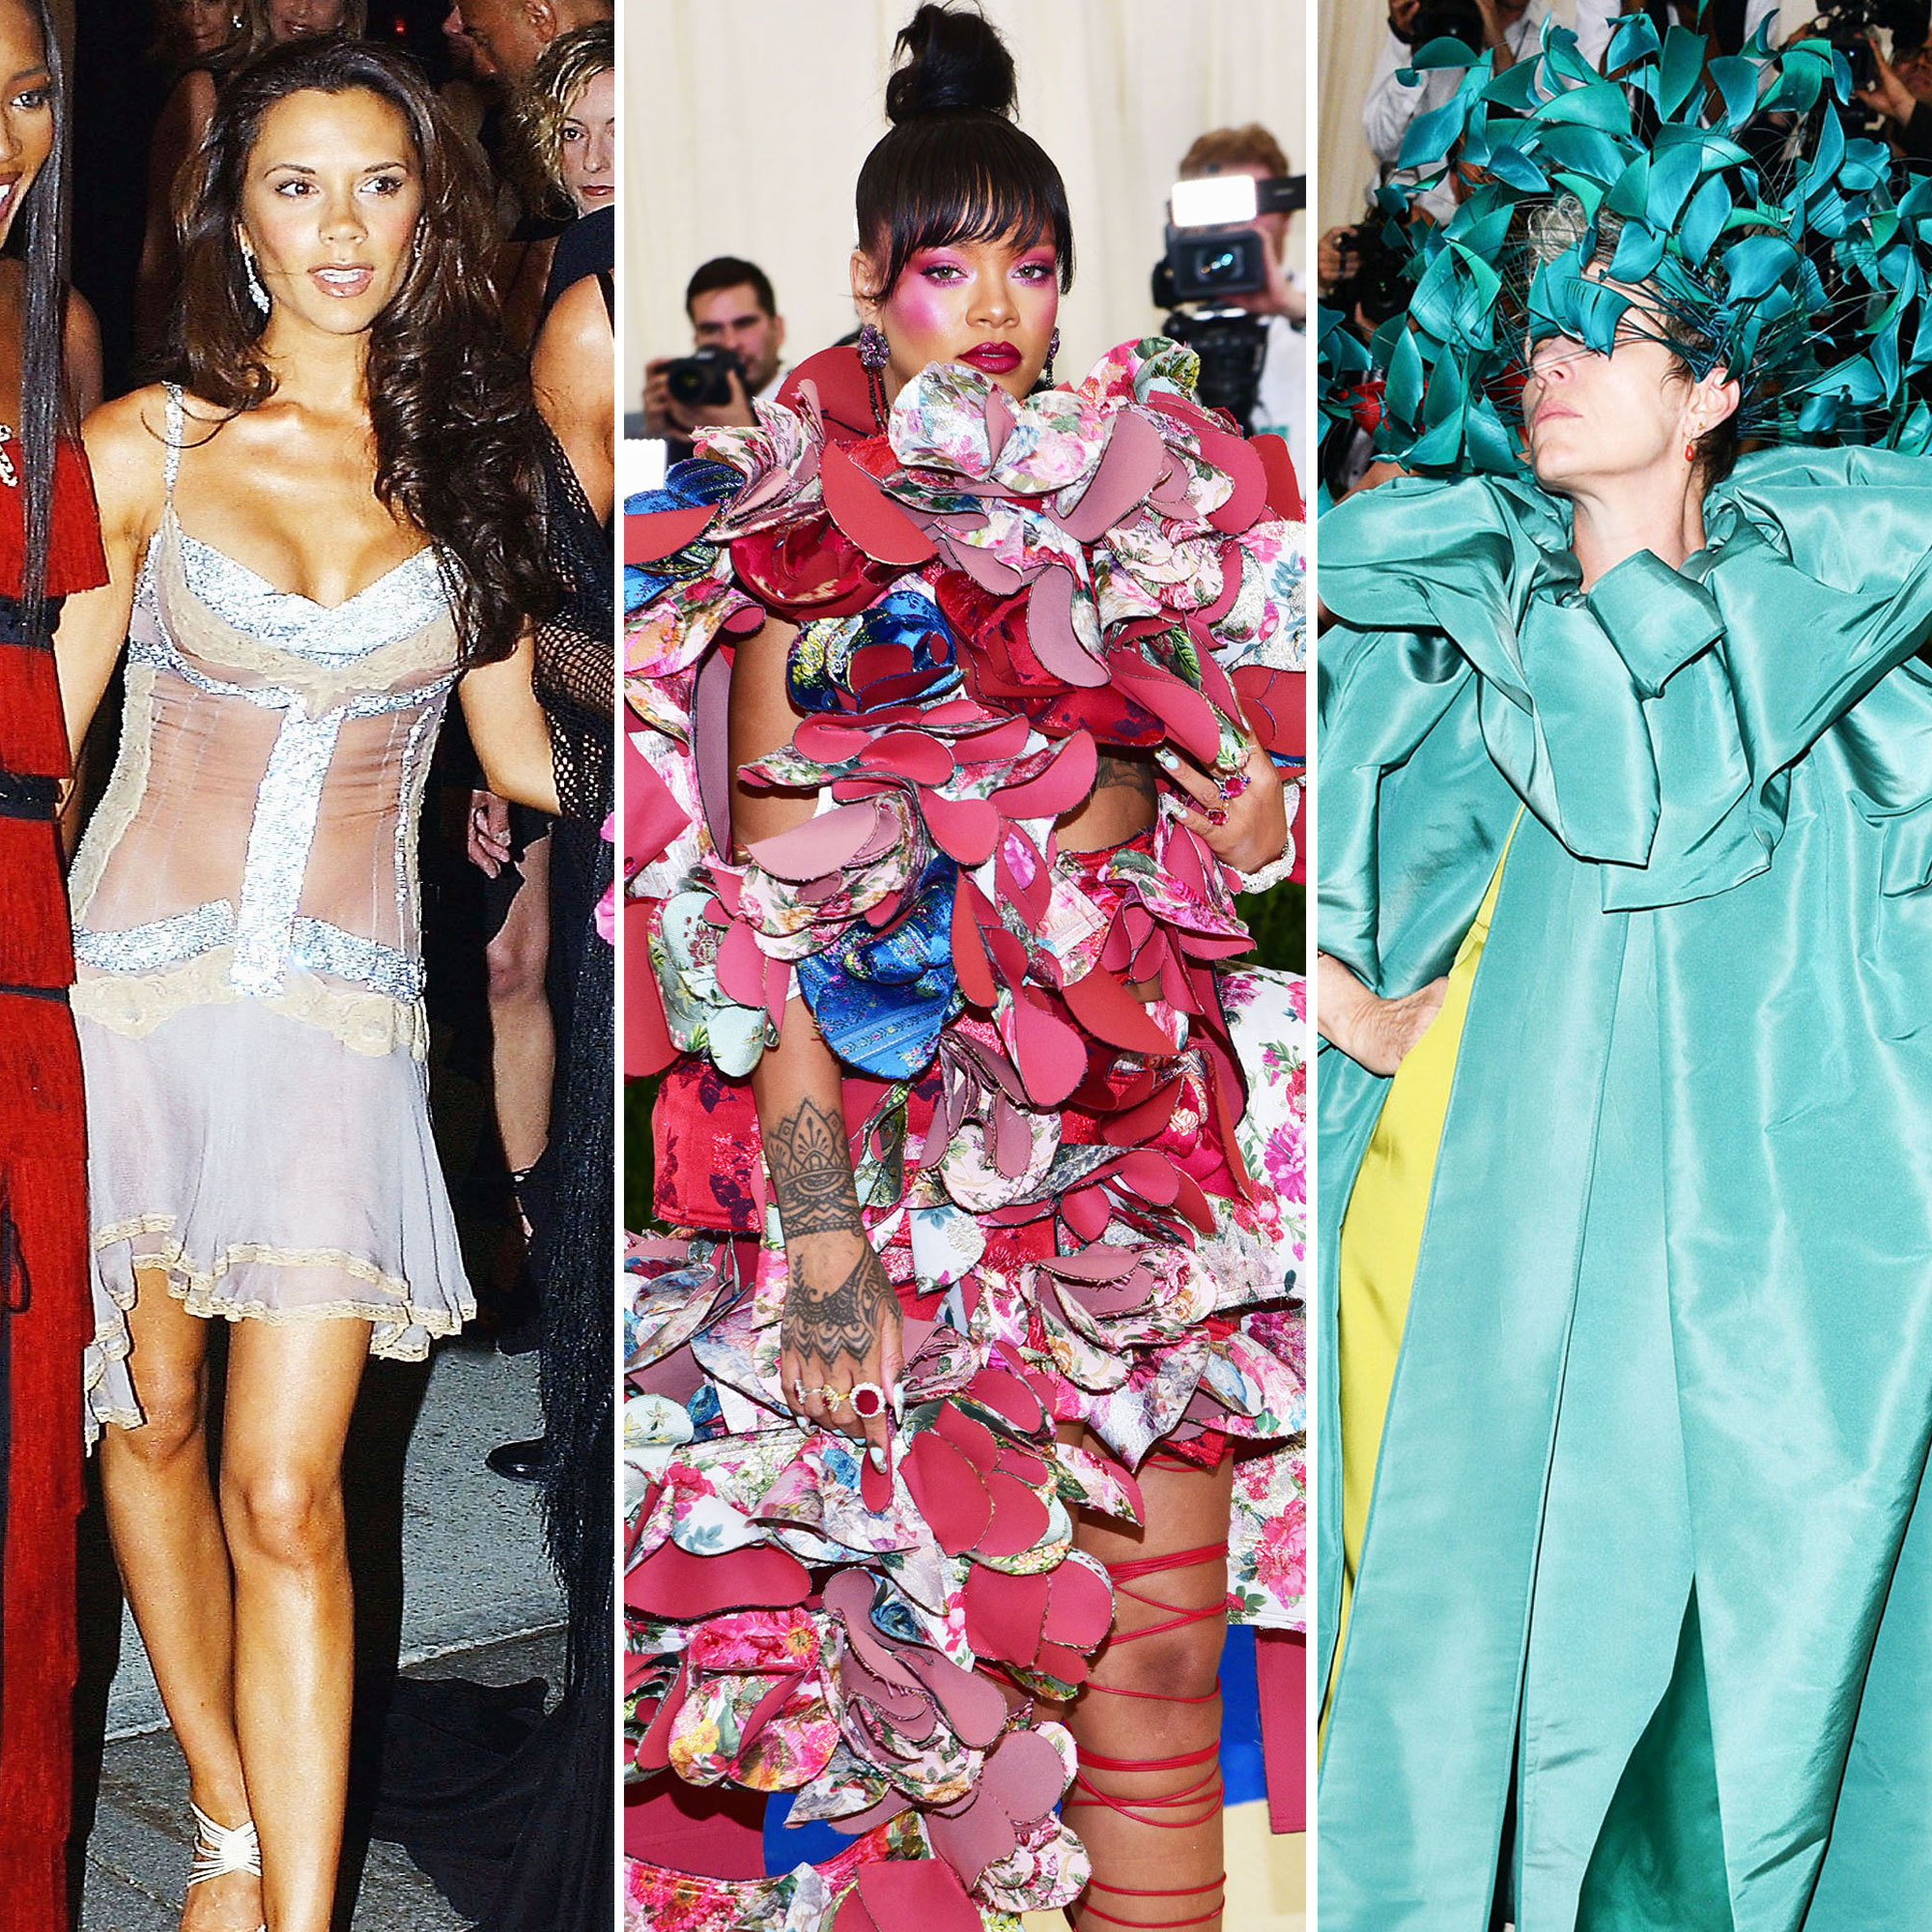 Victoria Beckham, Rihanna, and Frances McDormand The Wild Met Gala Red Carpet Fashion Looks We Can't Stop Thinking About - Victoria Beckham, Rihanna, and Frances McDormand